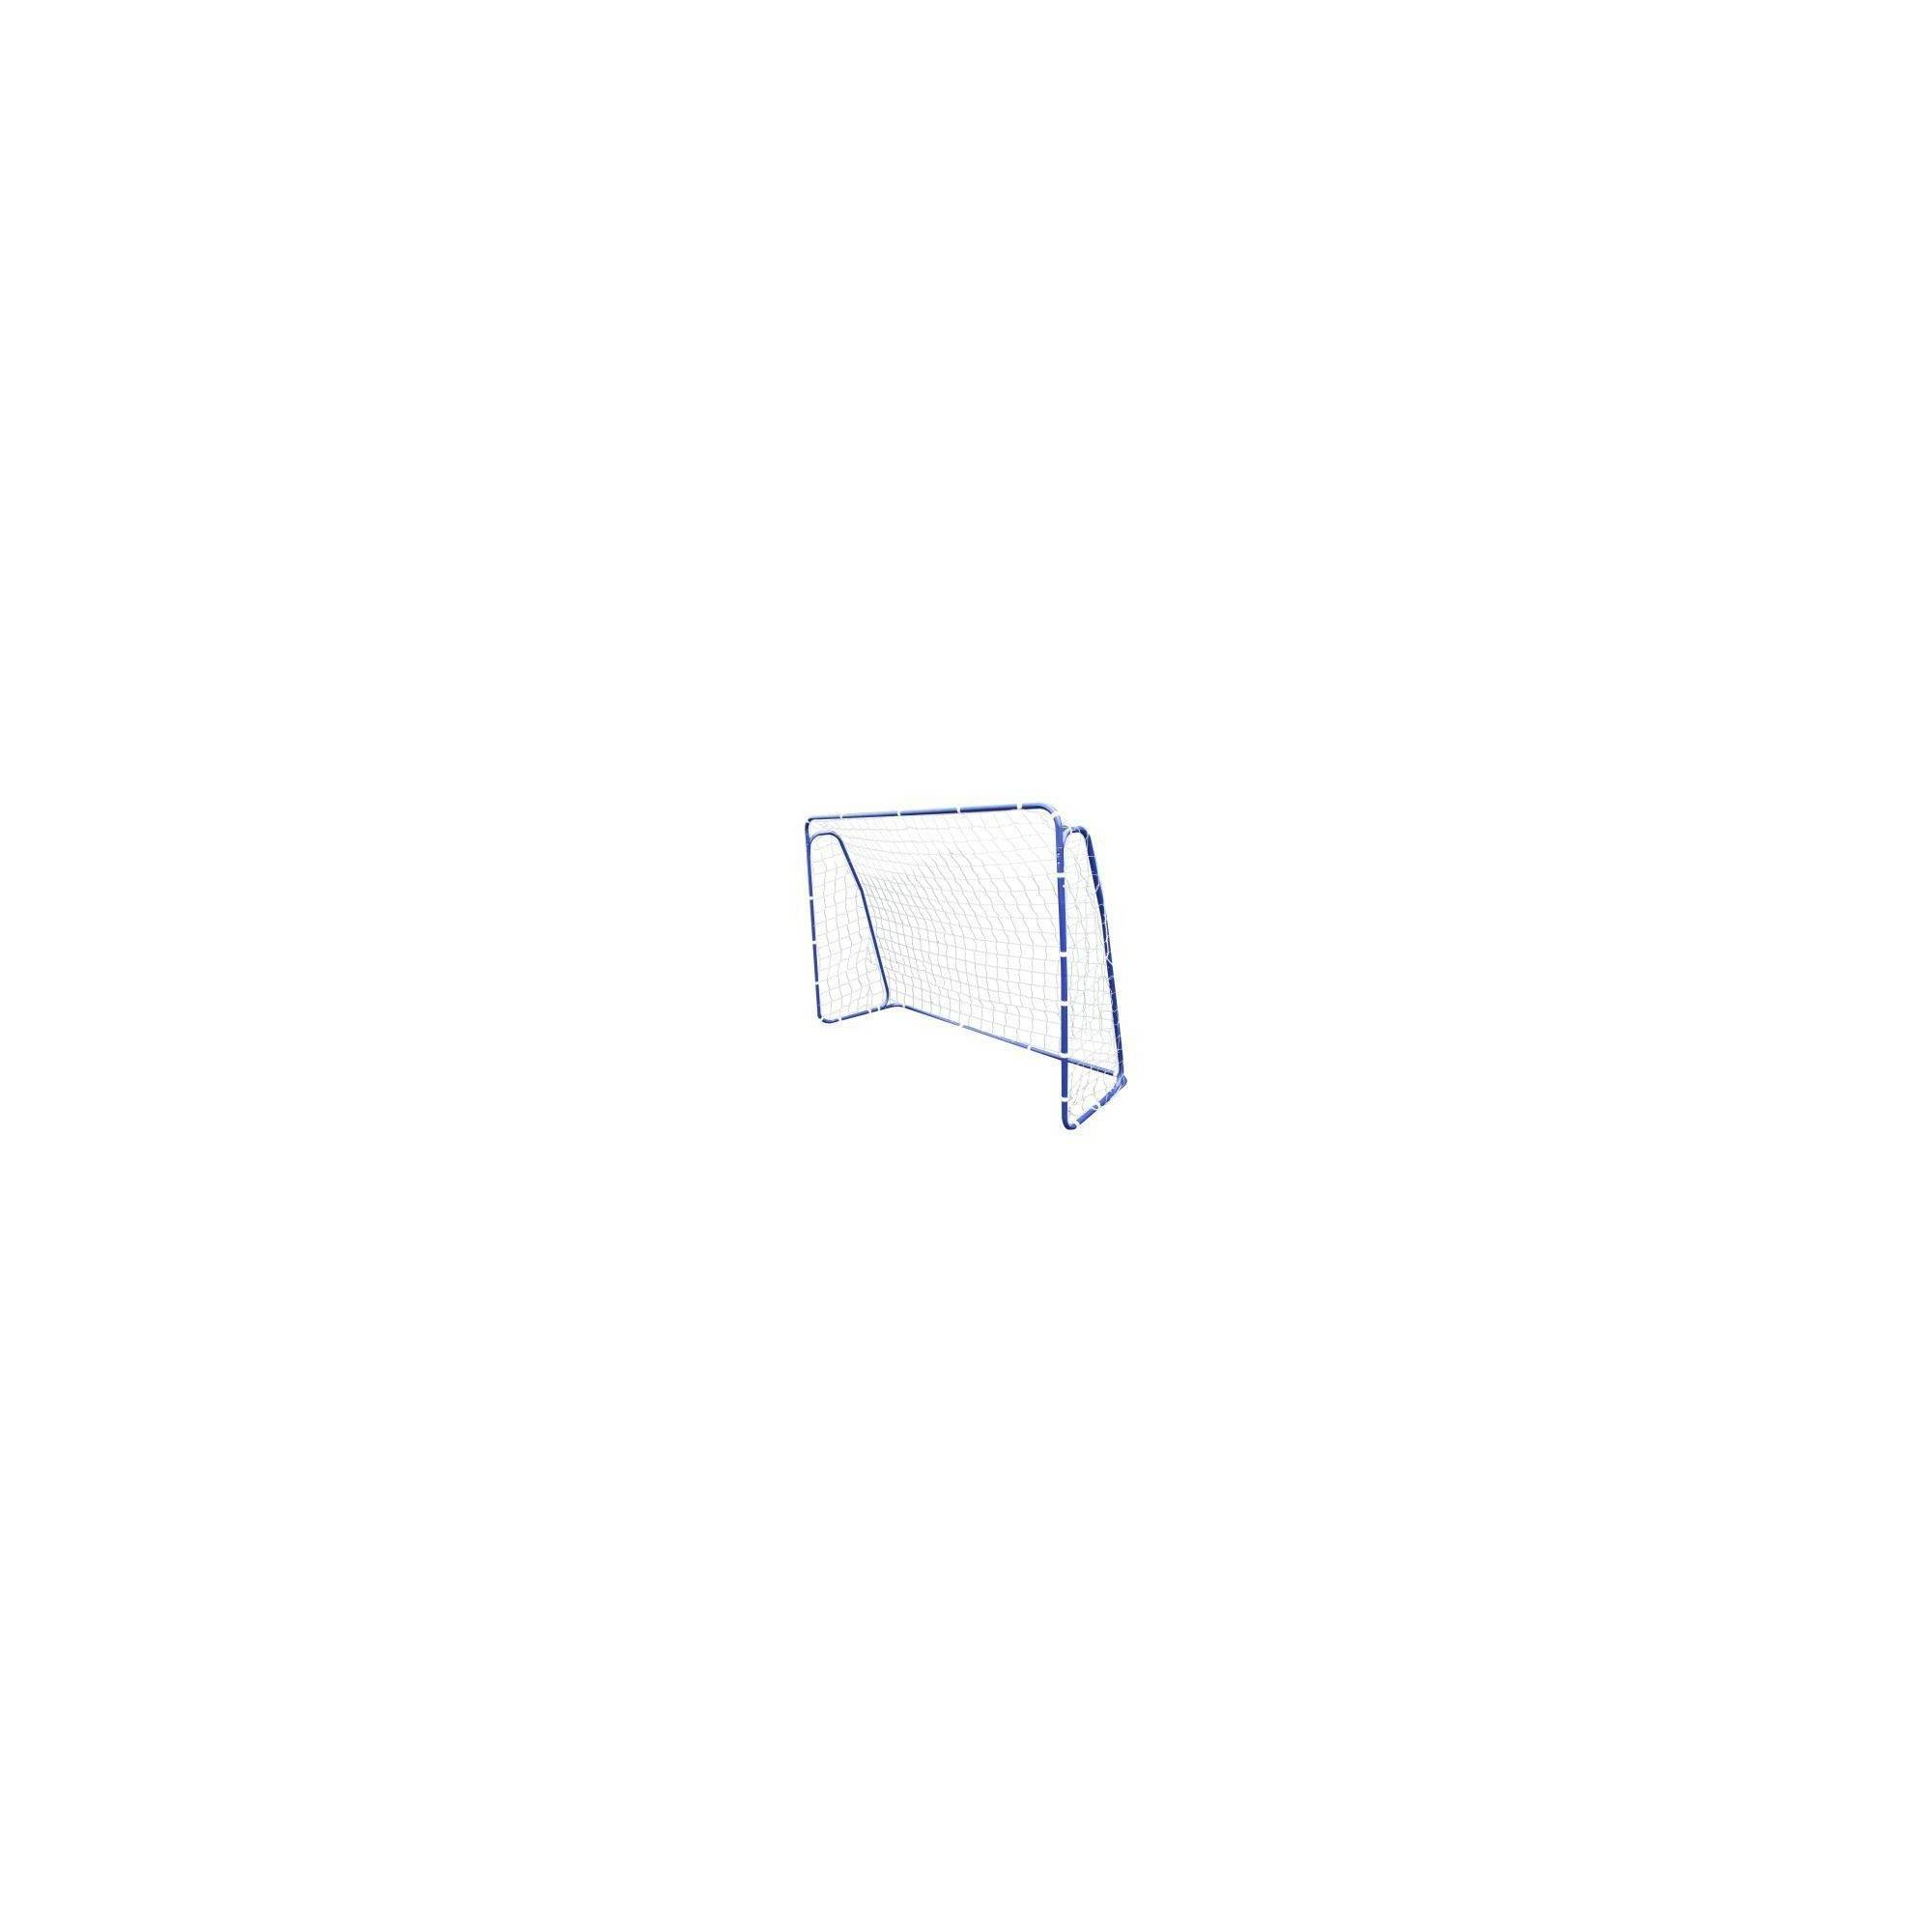 Bramka piłkarska 240 x 100 x 160 cm SPARTAN SPORT metalowa,producent: SPARTAN SPORT, zdjecie photo: 1   online shop klubfitness.